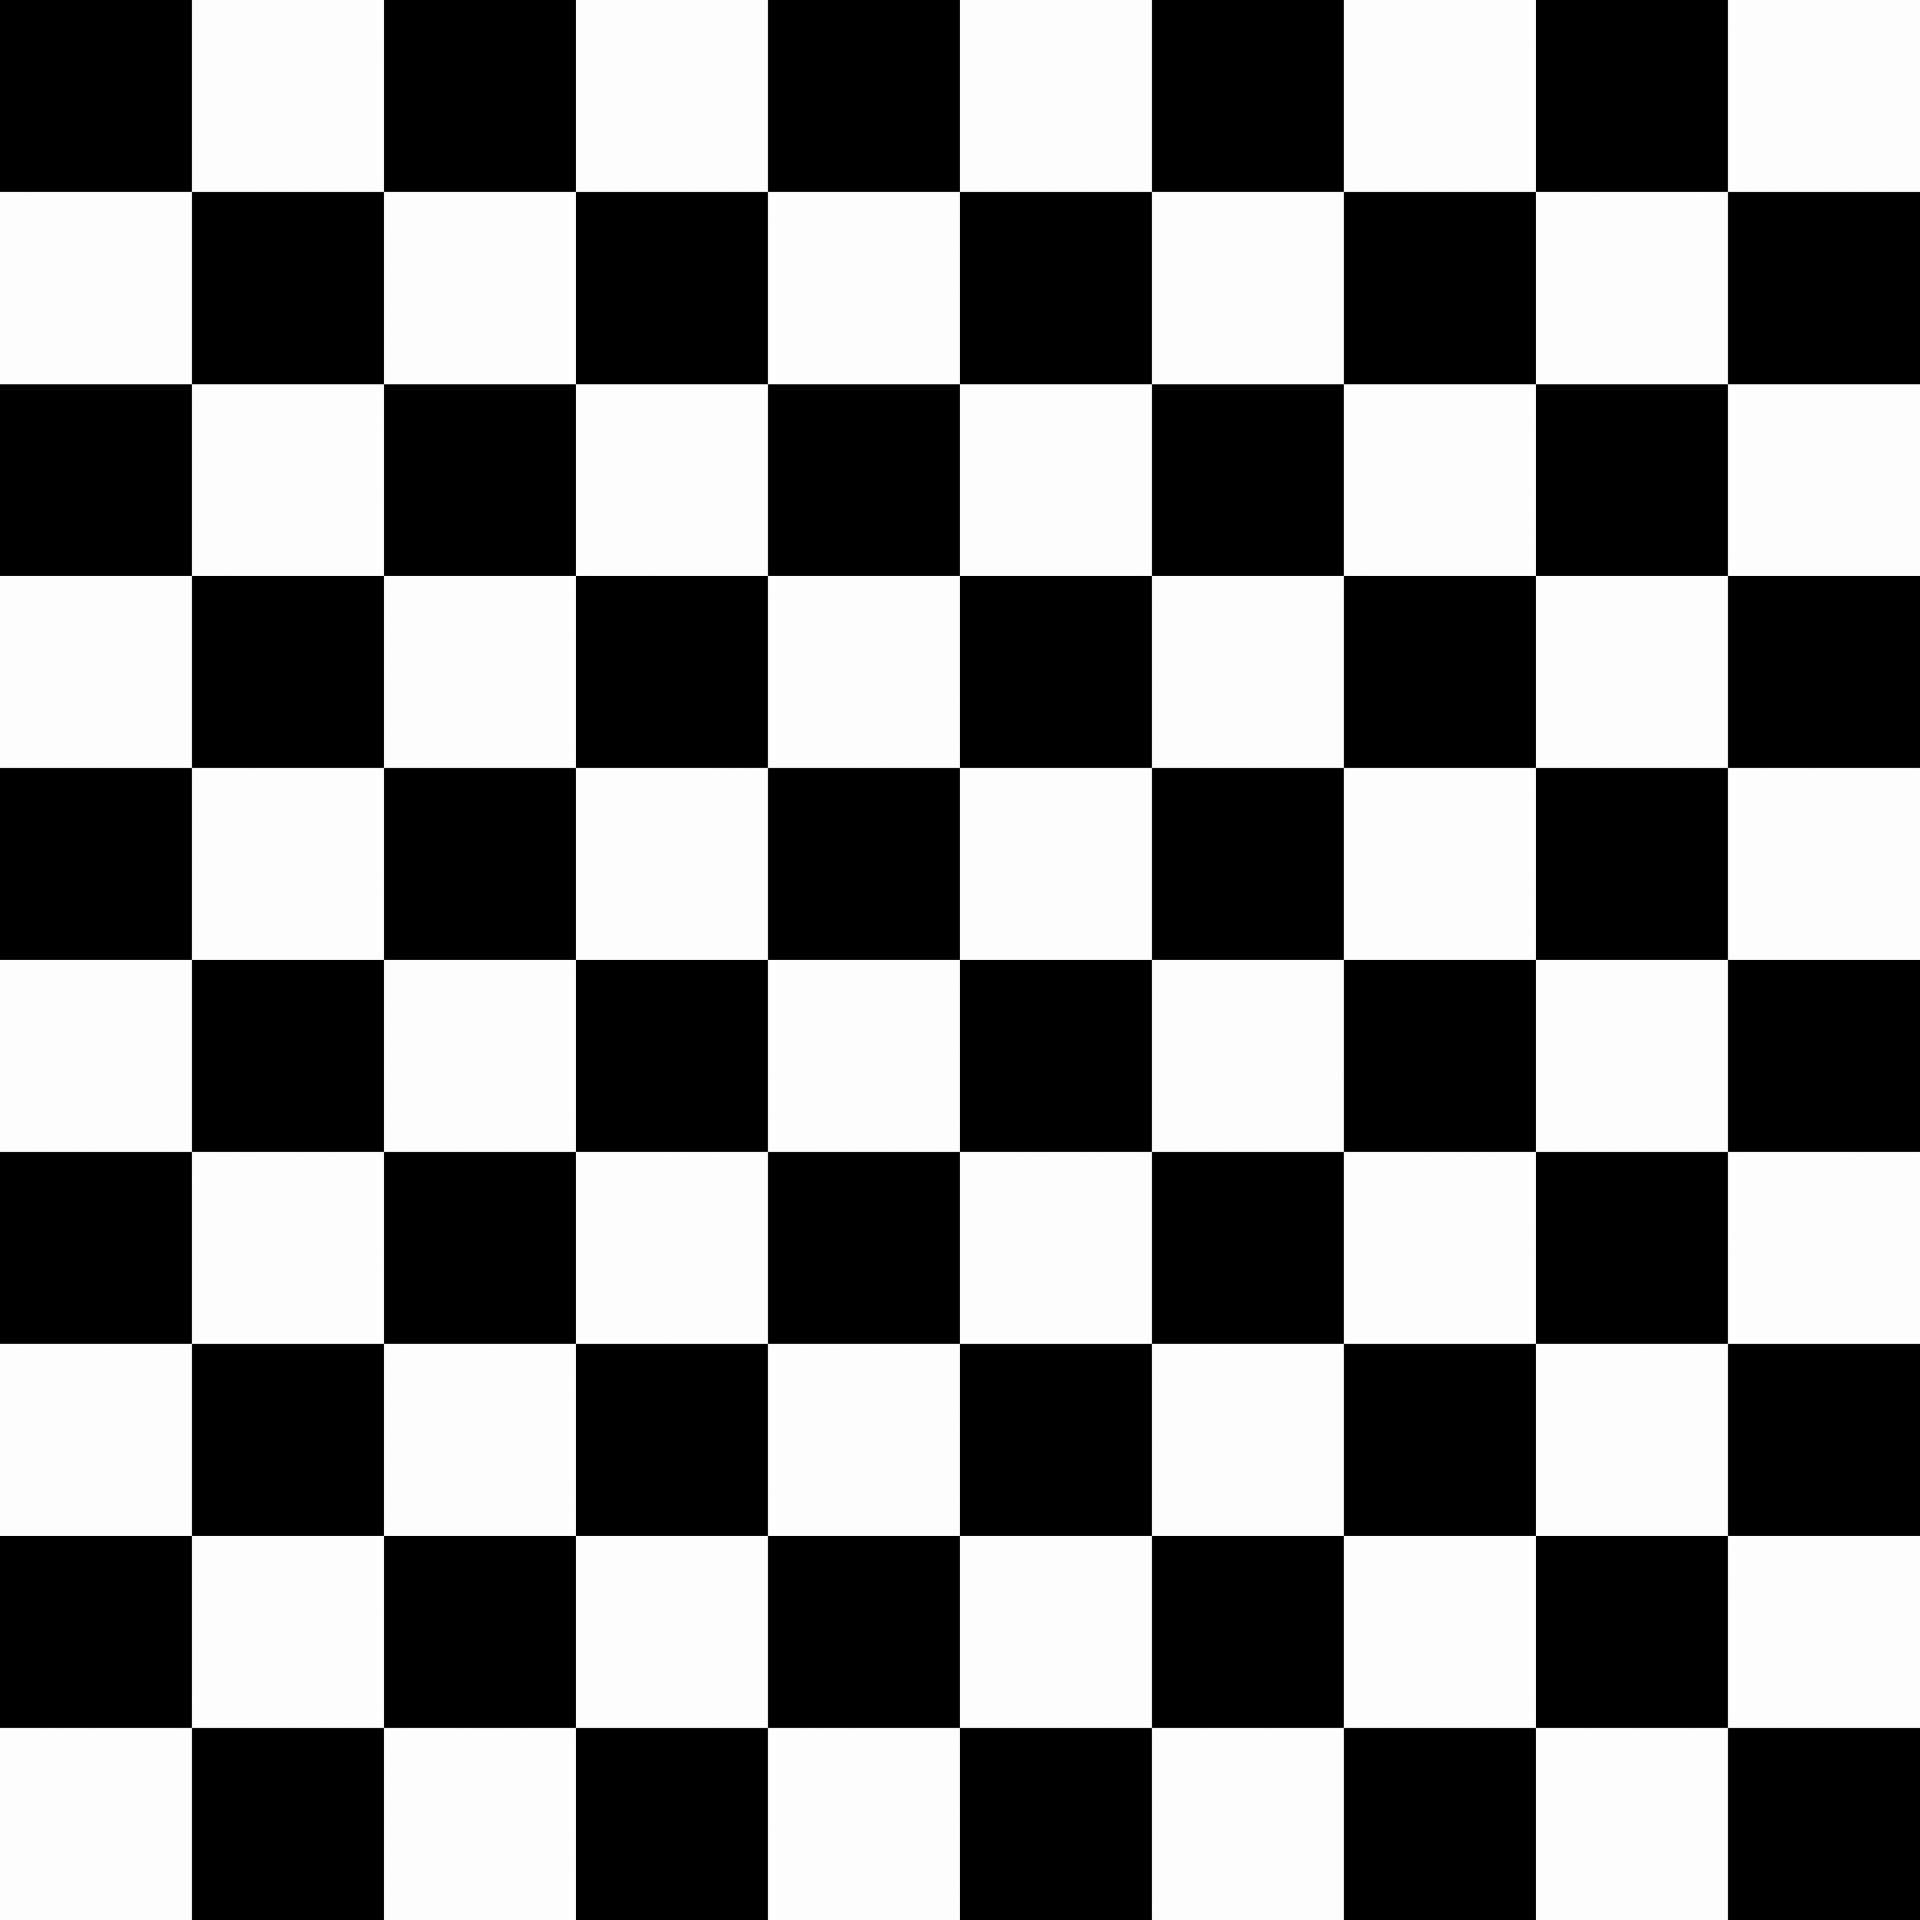 Pictures Of A Checker Board Elegant Checkerboard Squares Black White Free Stock Public